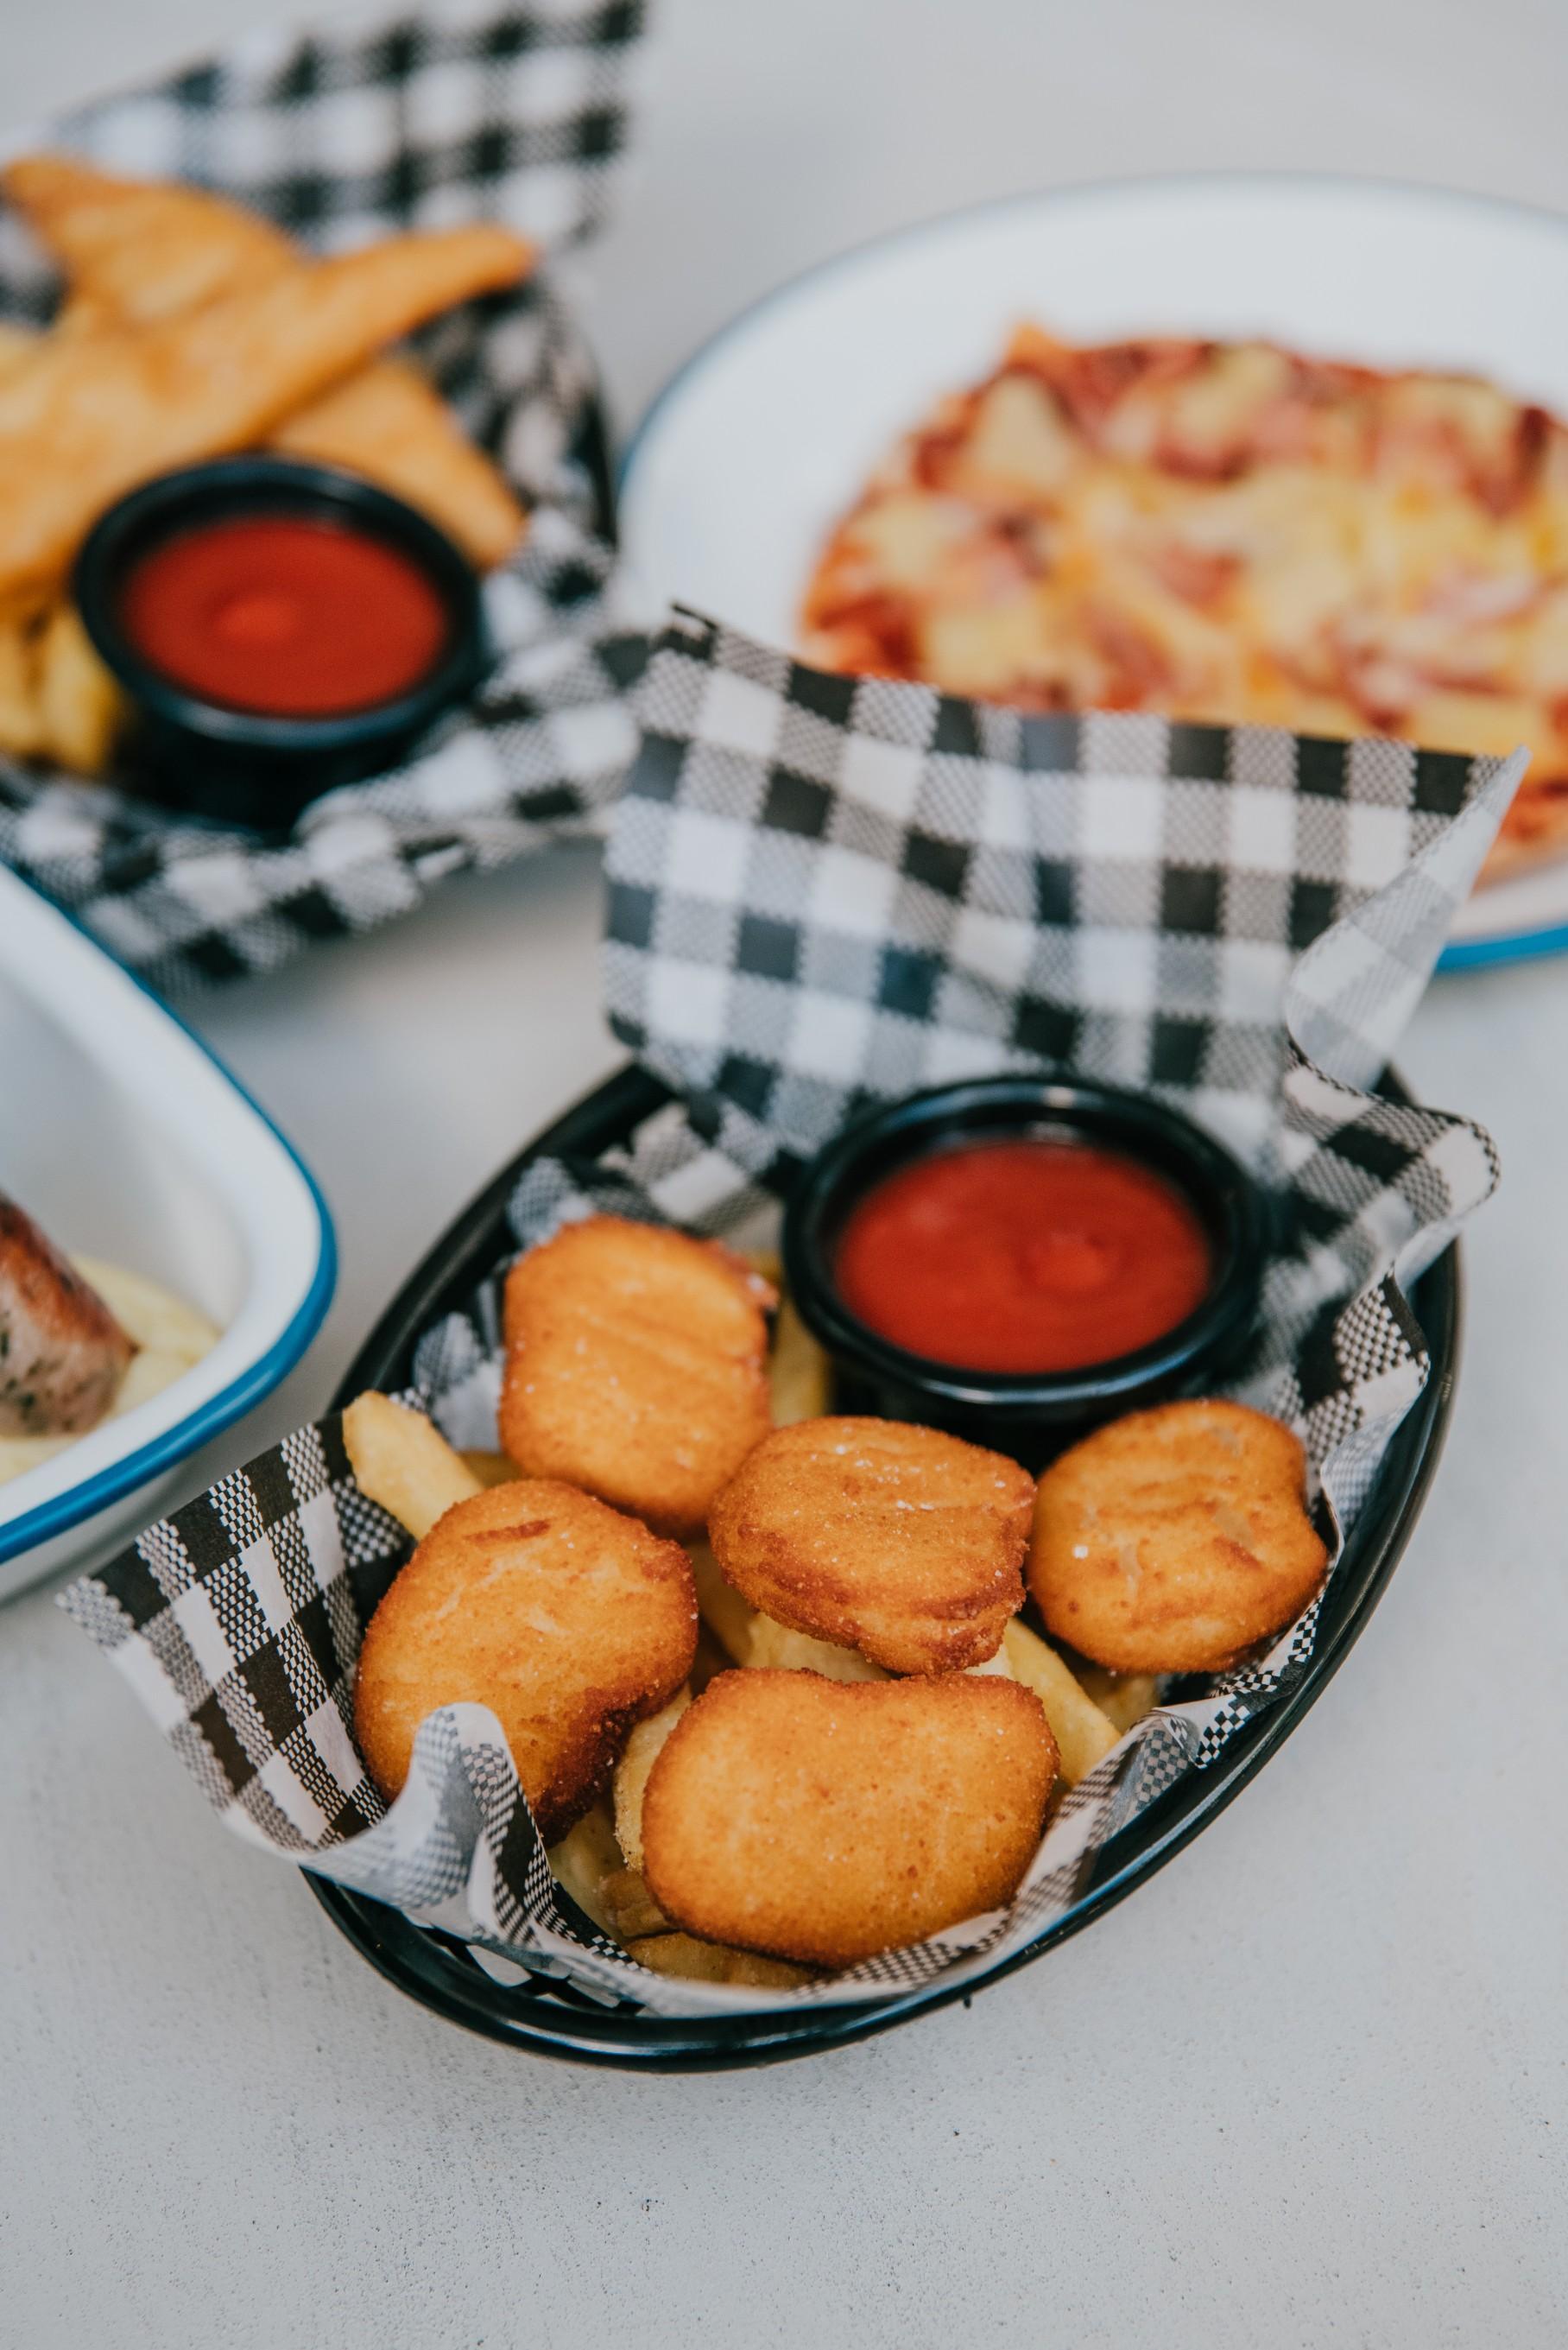 Argenton Food Shoot 1 (August 2018) - Full Res-48.jpg